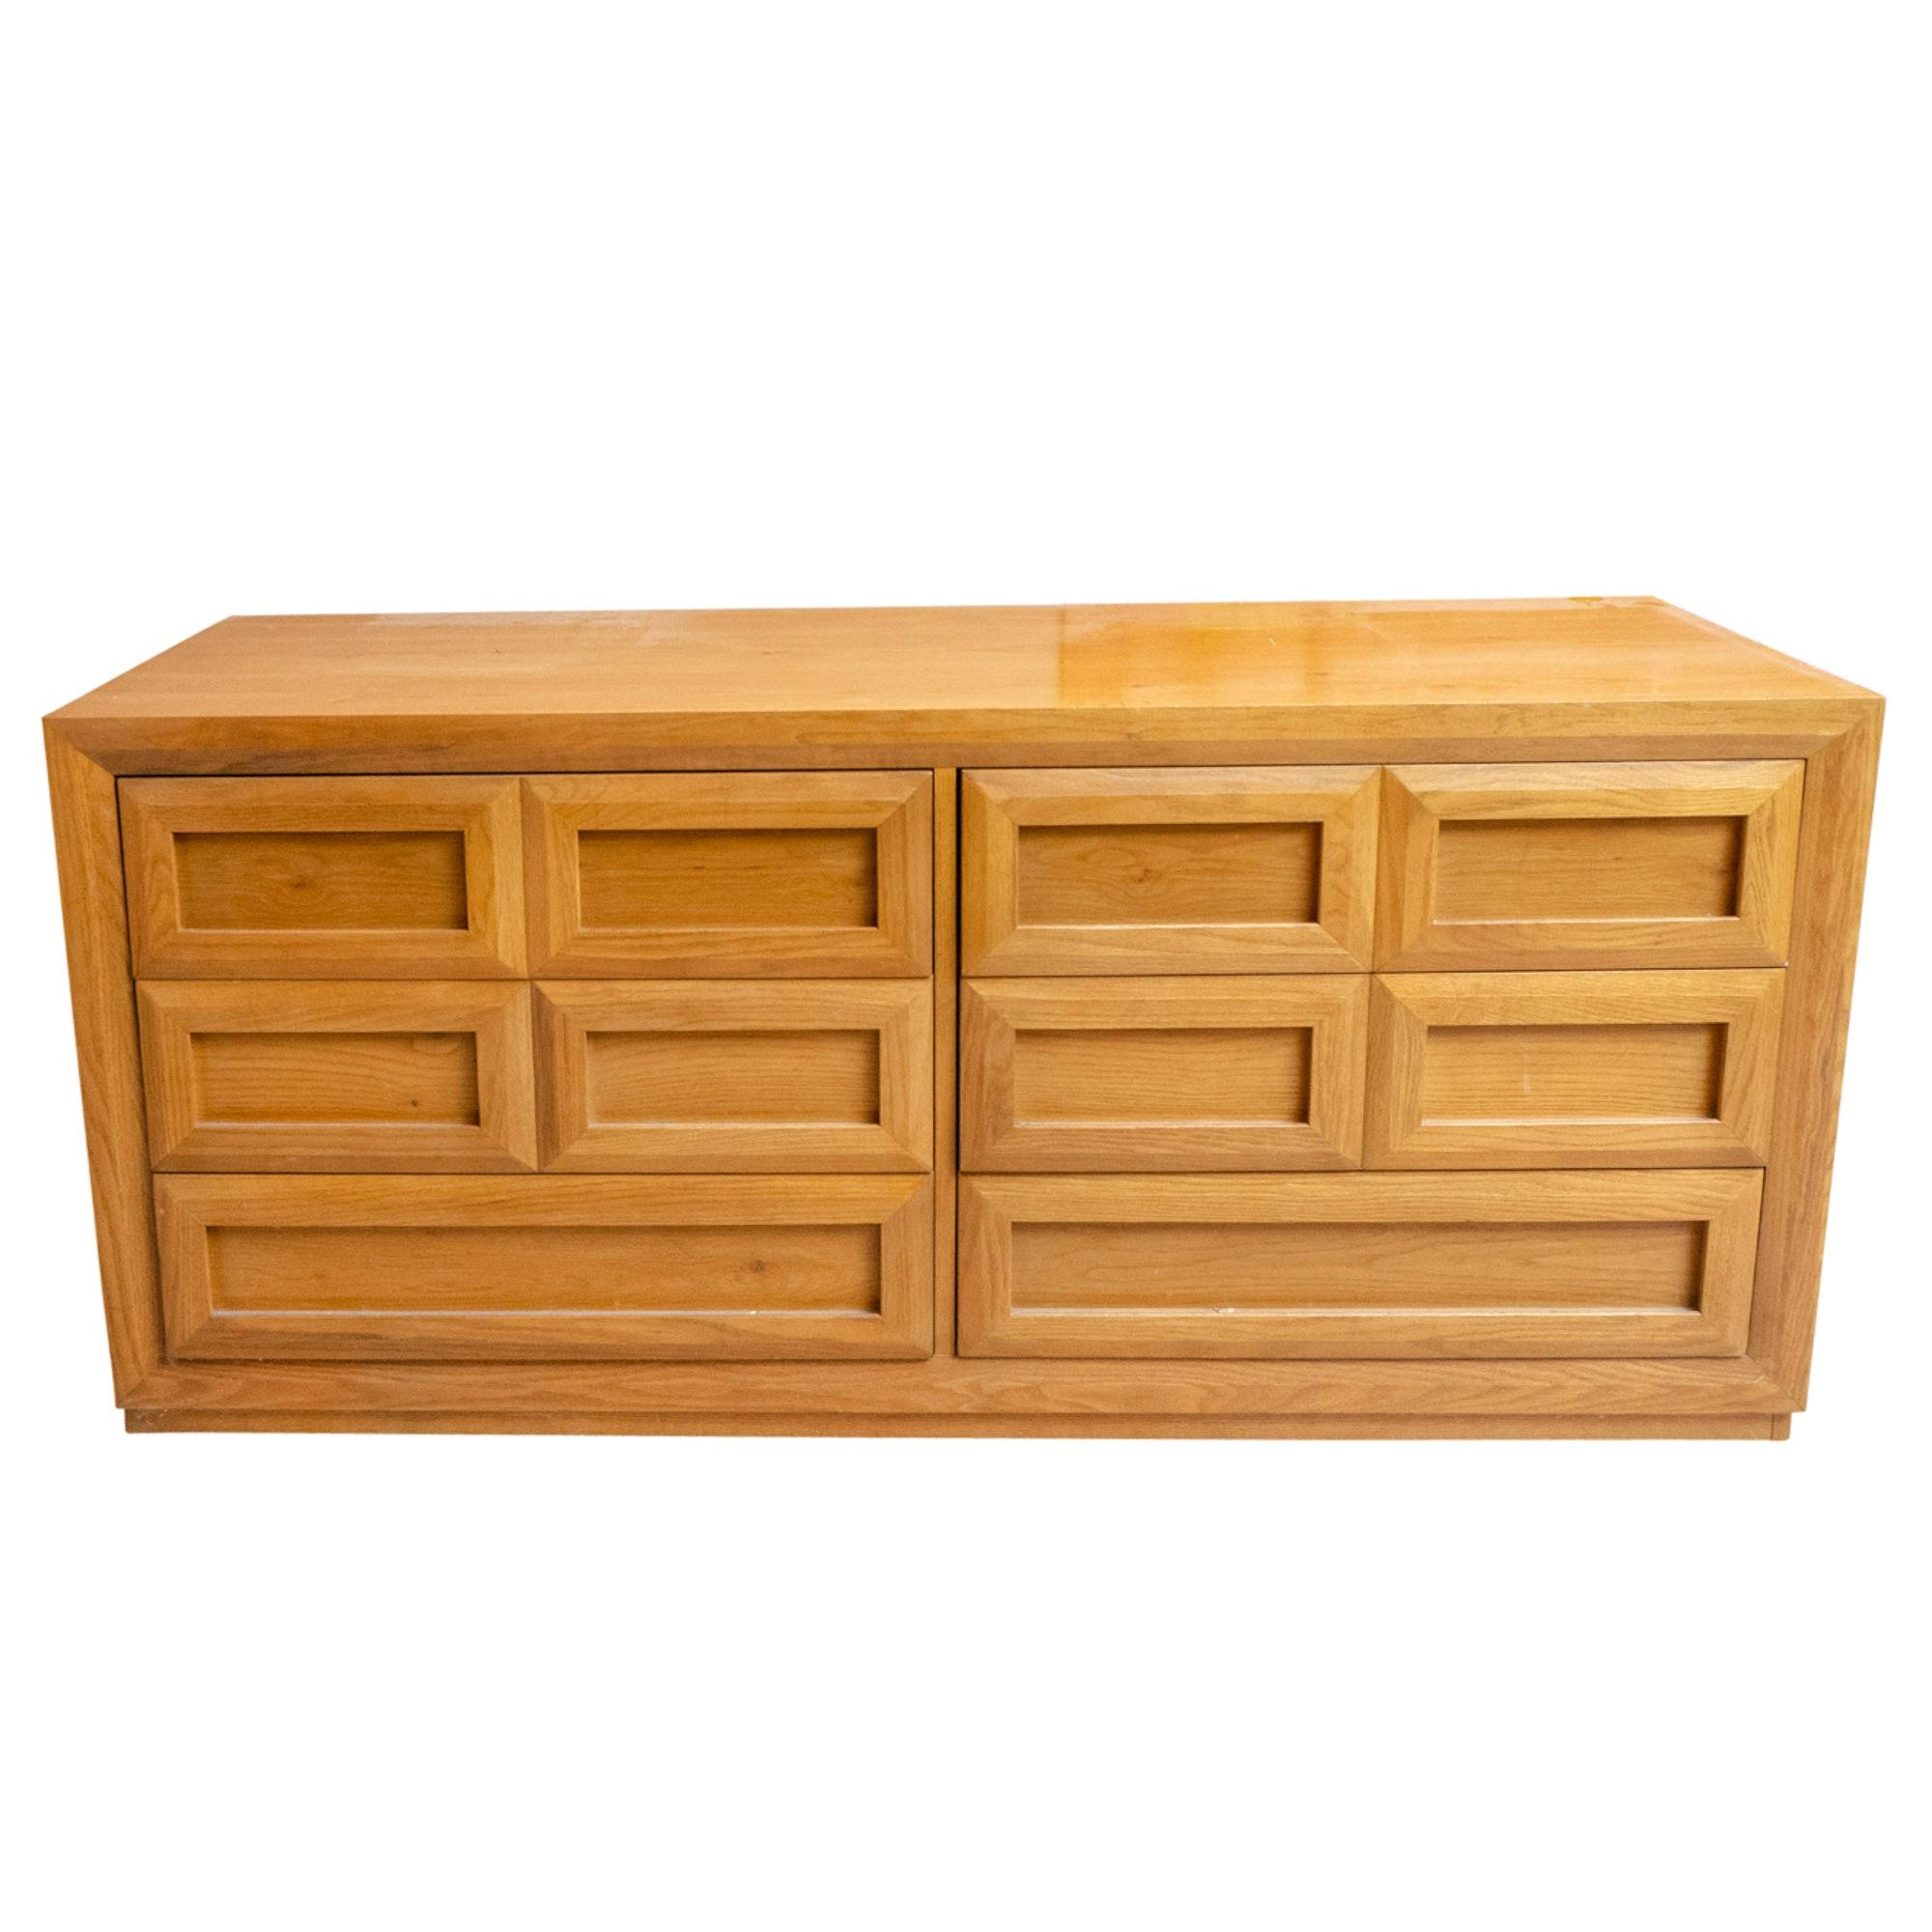 Thomasville Mid Century Modern Style Oak Chest of Drawers